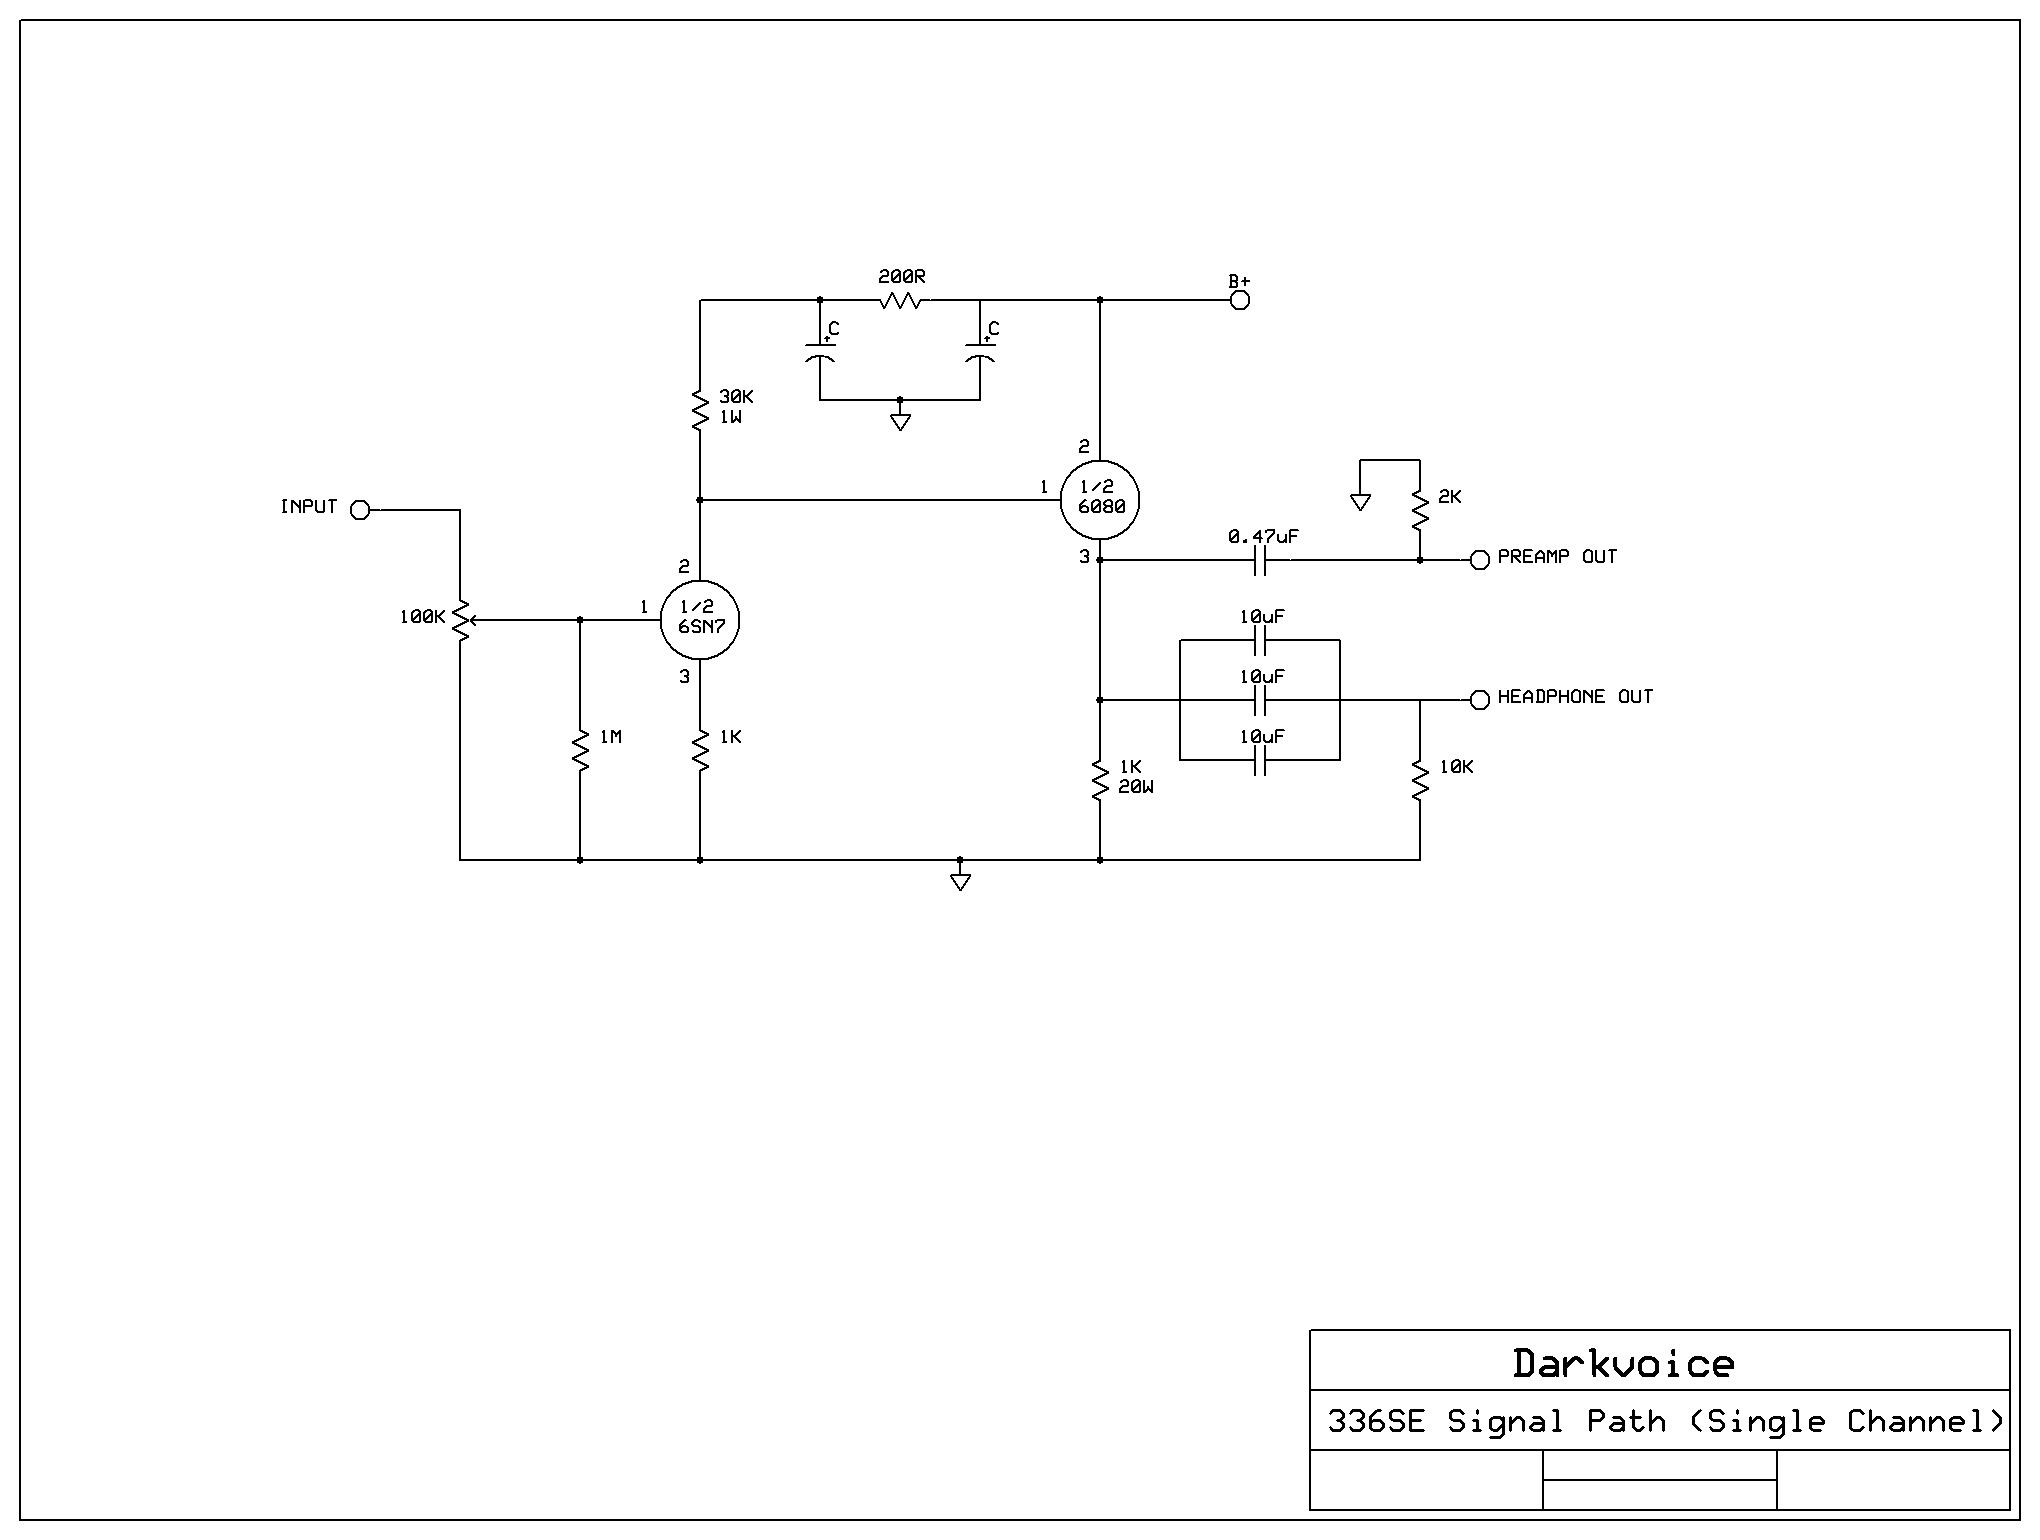 Yaqin Cd3 Darkvoice 336se Mods Coupling Caps Polk Audio Headphone Cable Wiring Diagram Signal Path